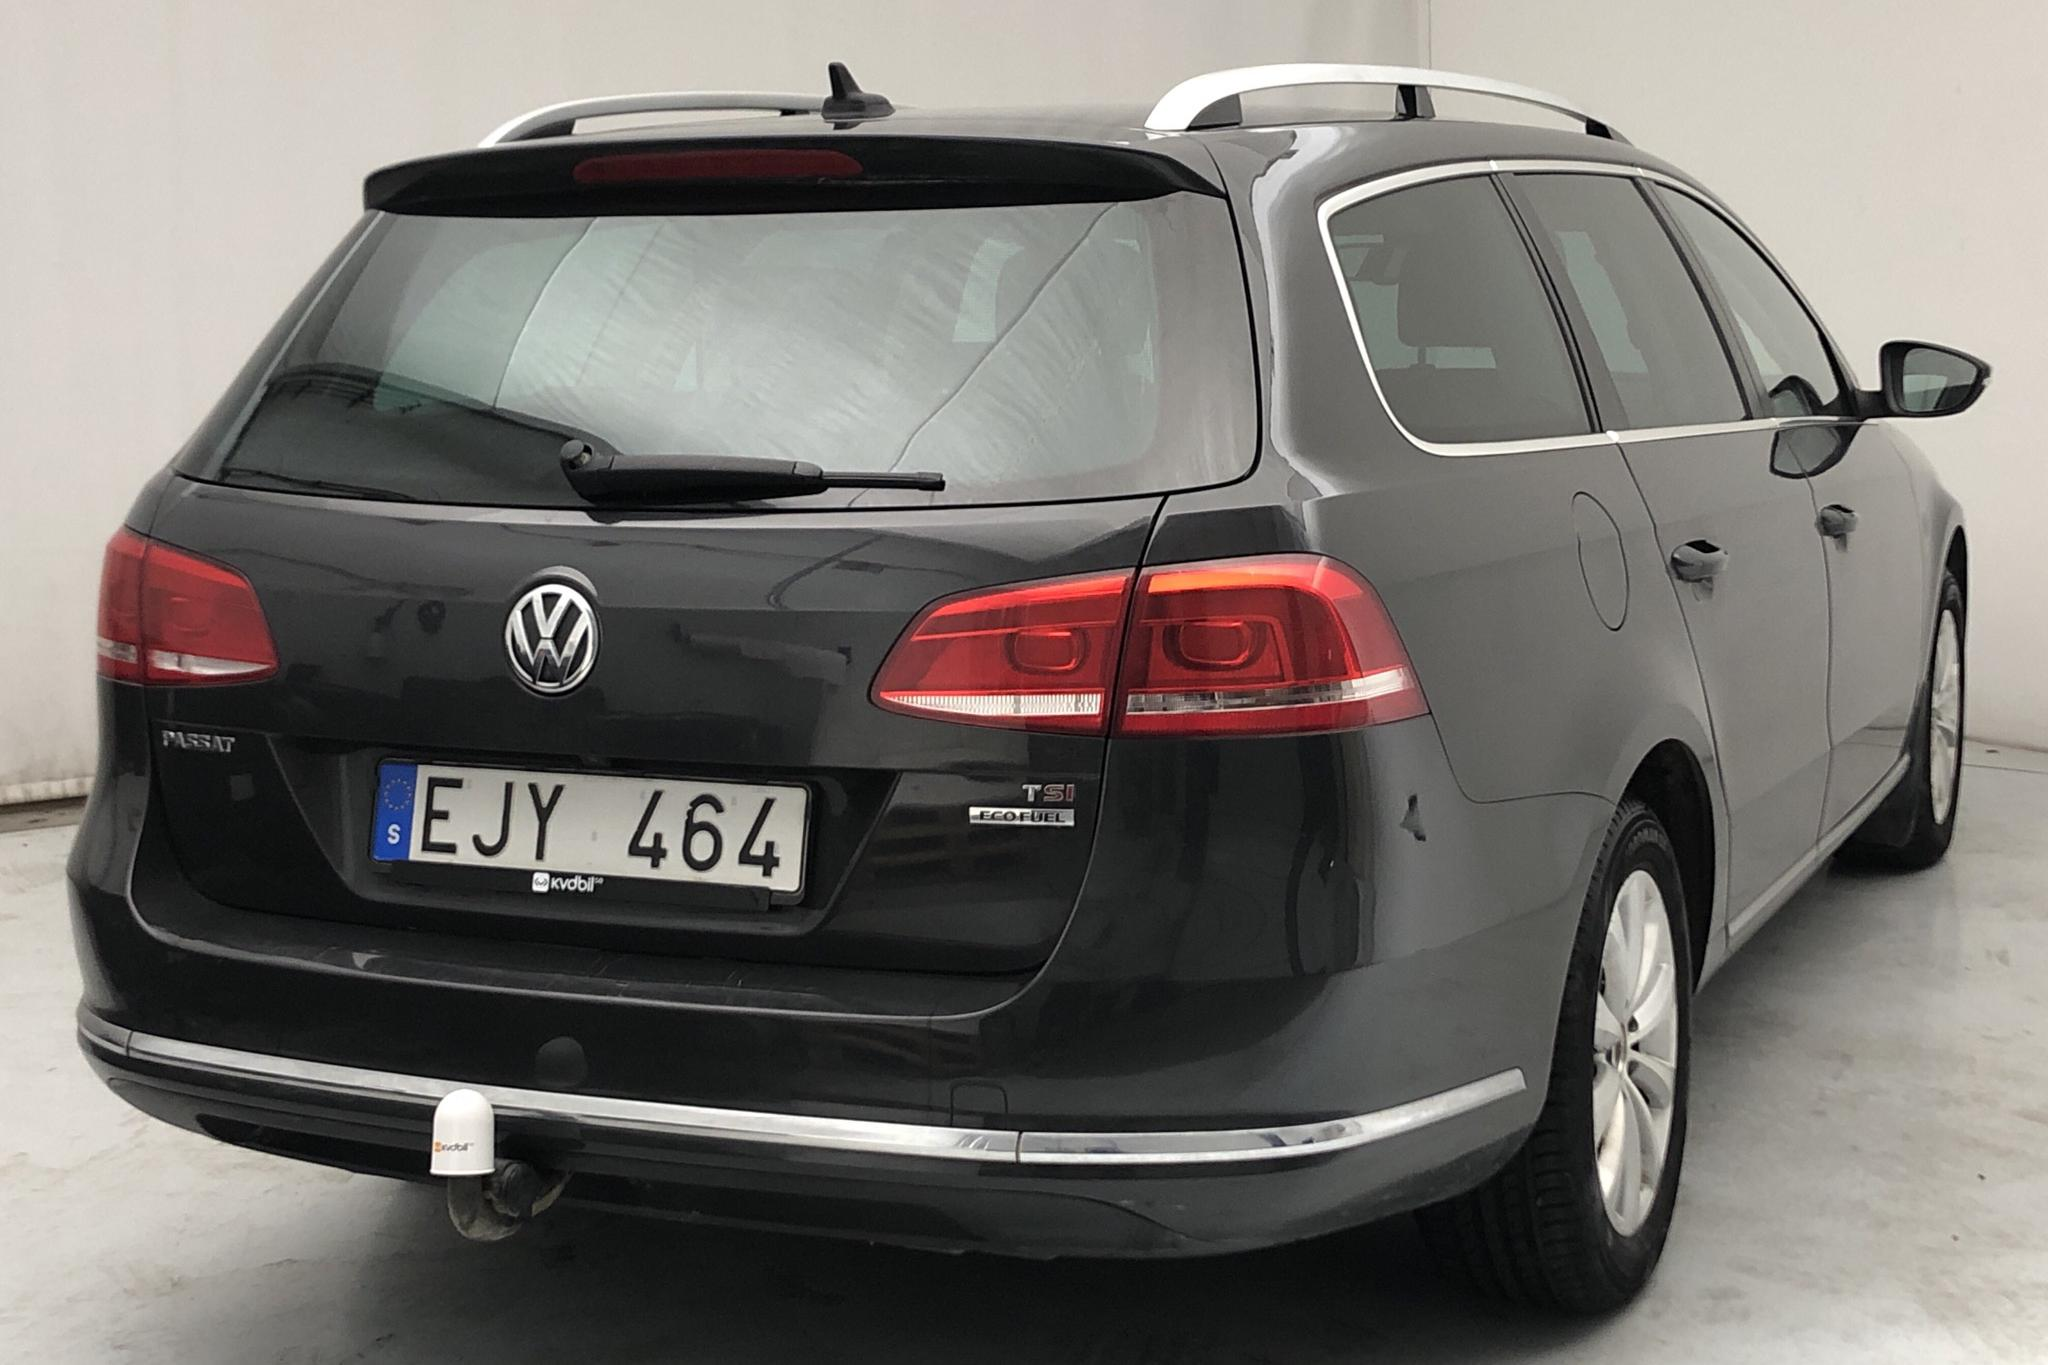 VW Passat 1.4 TSI EcoFuel Variant (150hk) - 19 593 mil - Manuell - Dark Grey - 2013